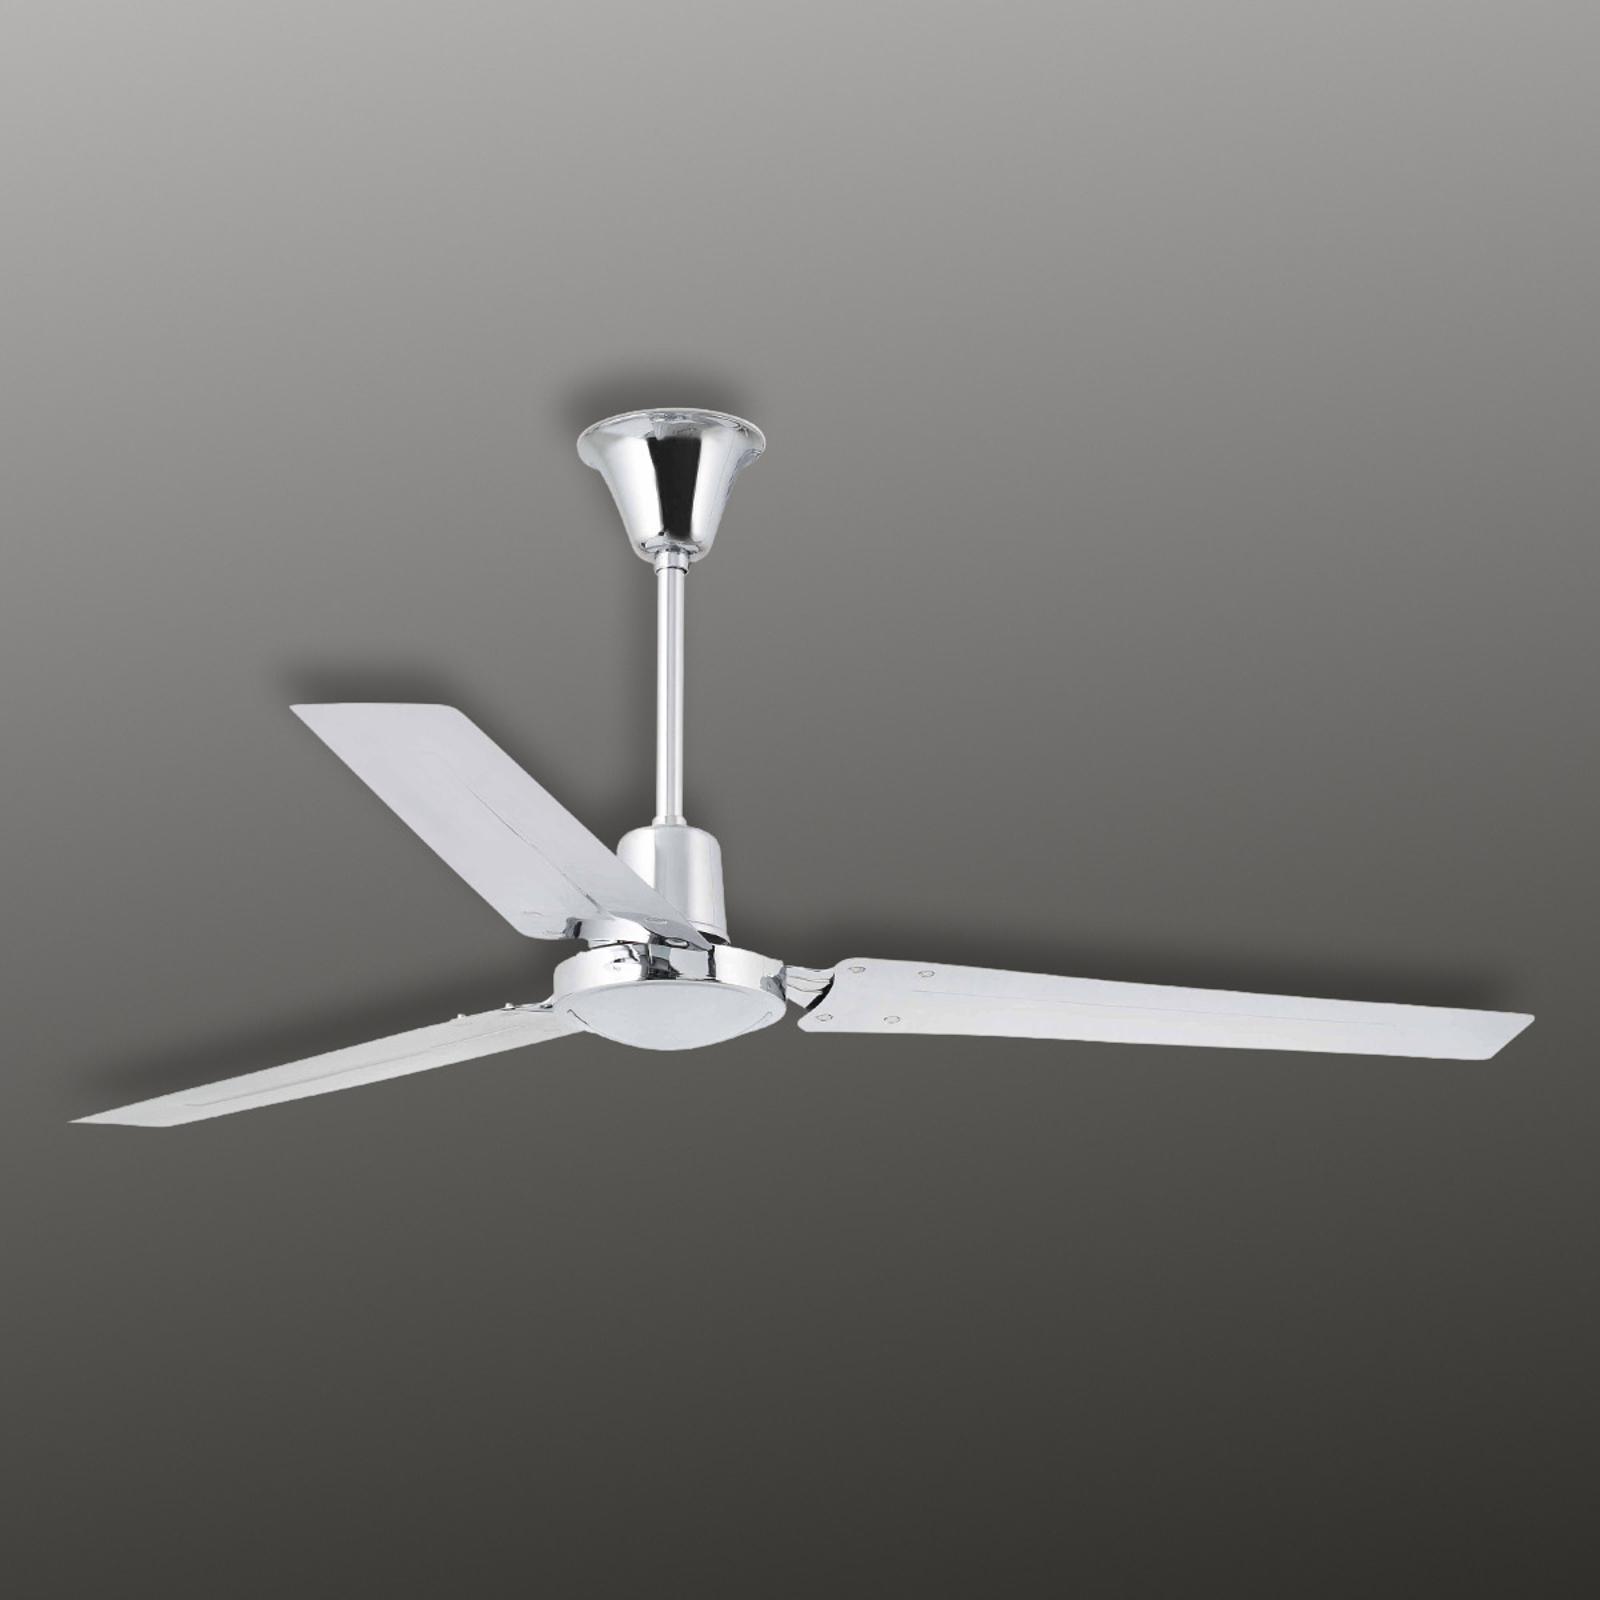 INDUS - modern ceiling fan, chrome_3506073_1